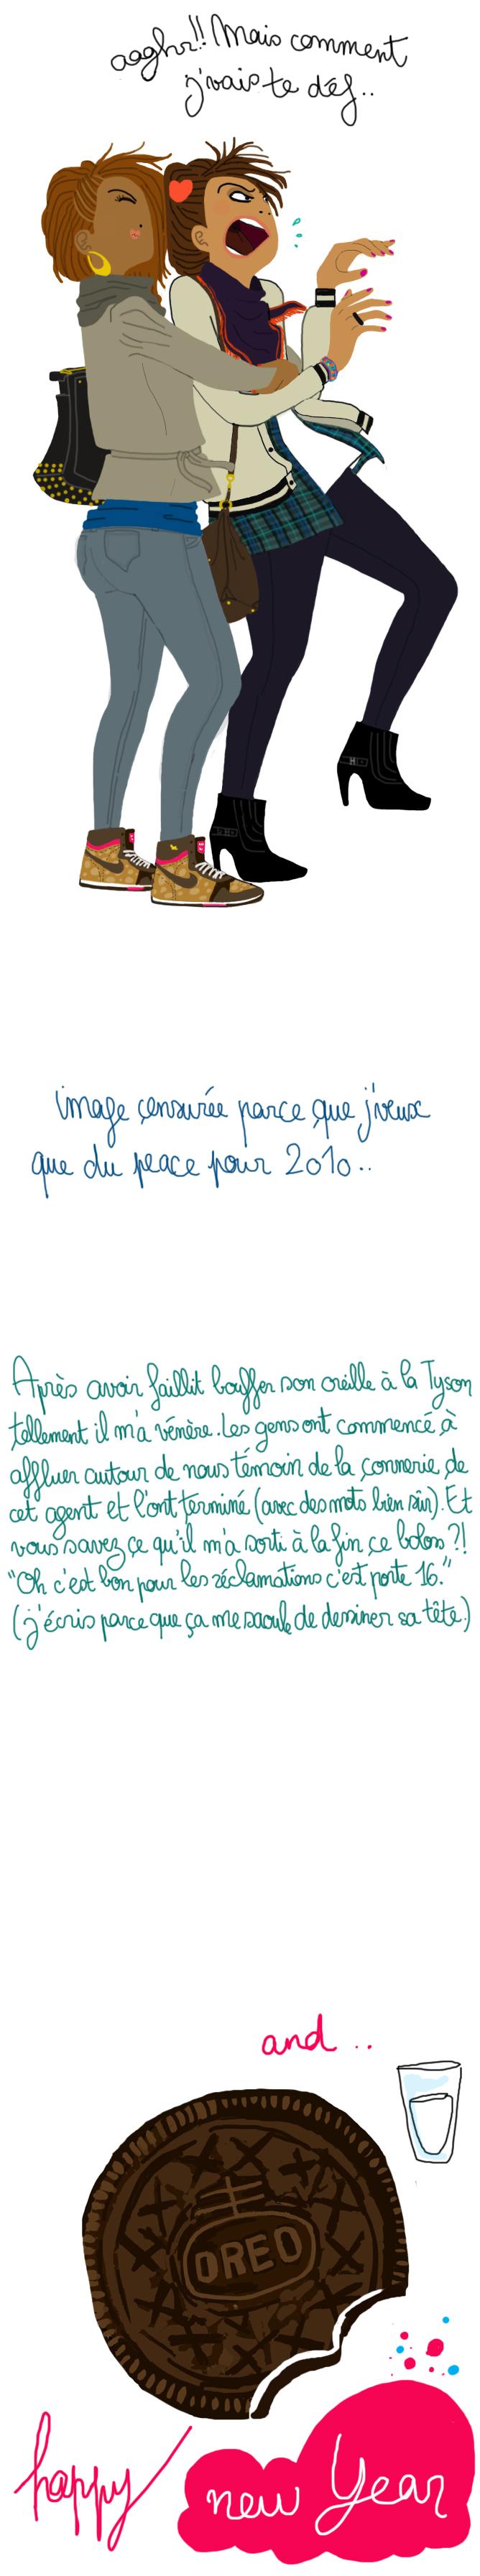 http://getfiles.free.fr/sanaa/Train4.jpg